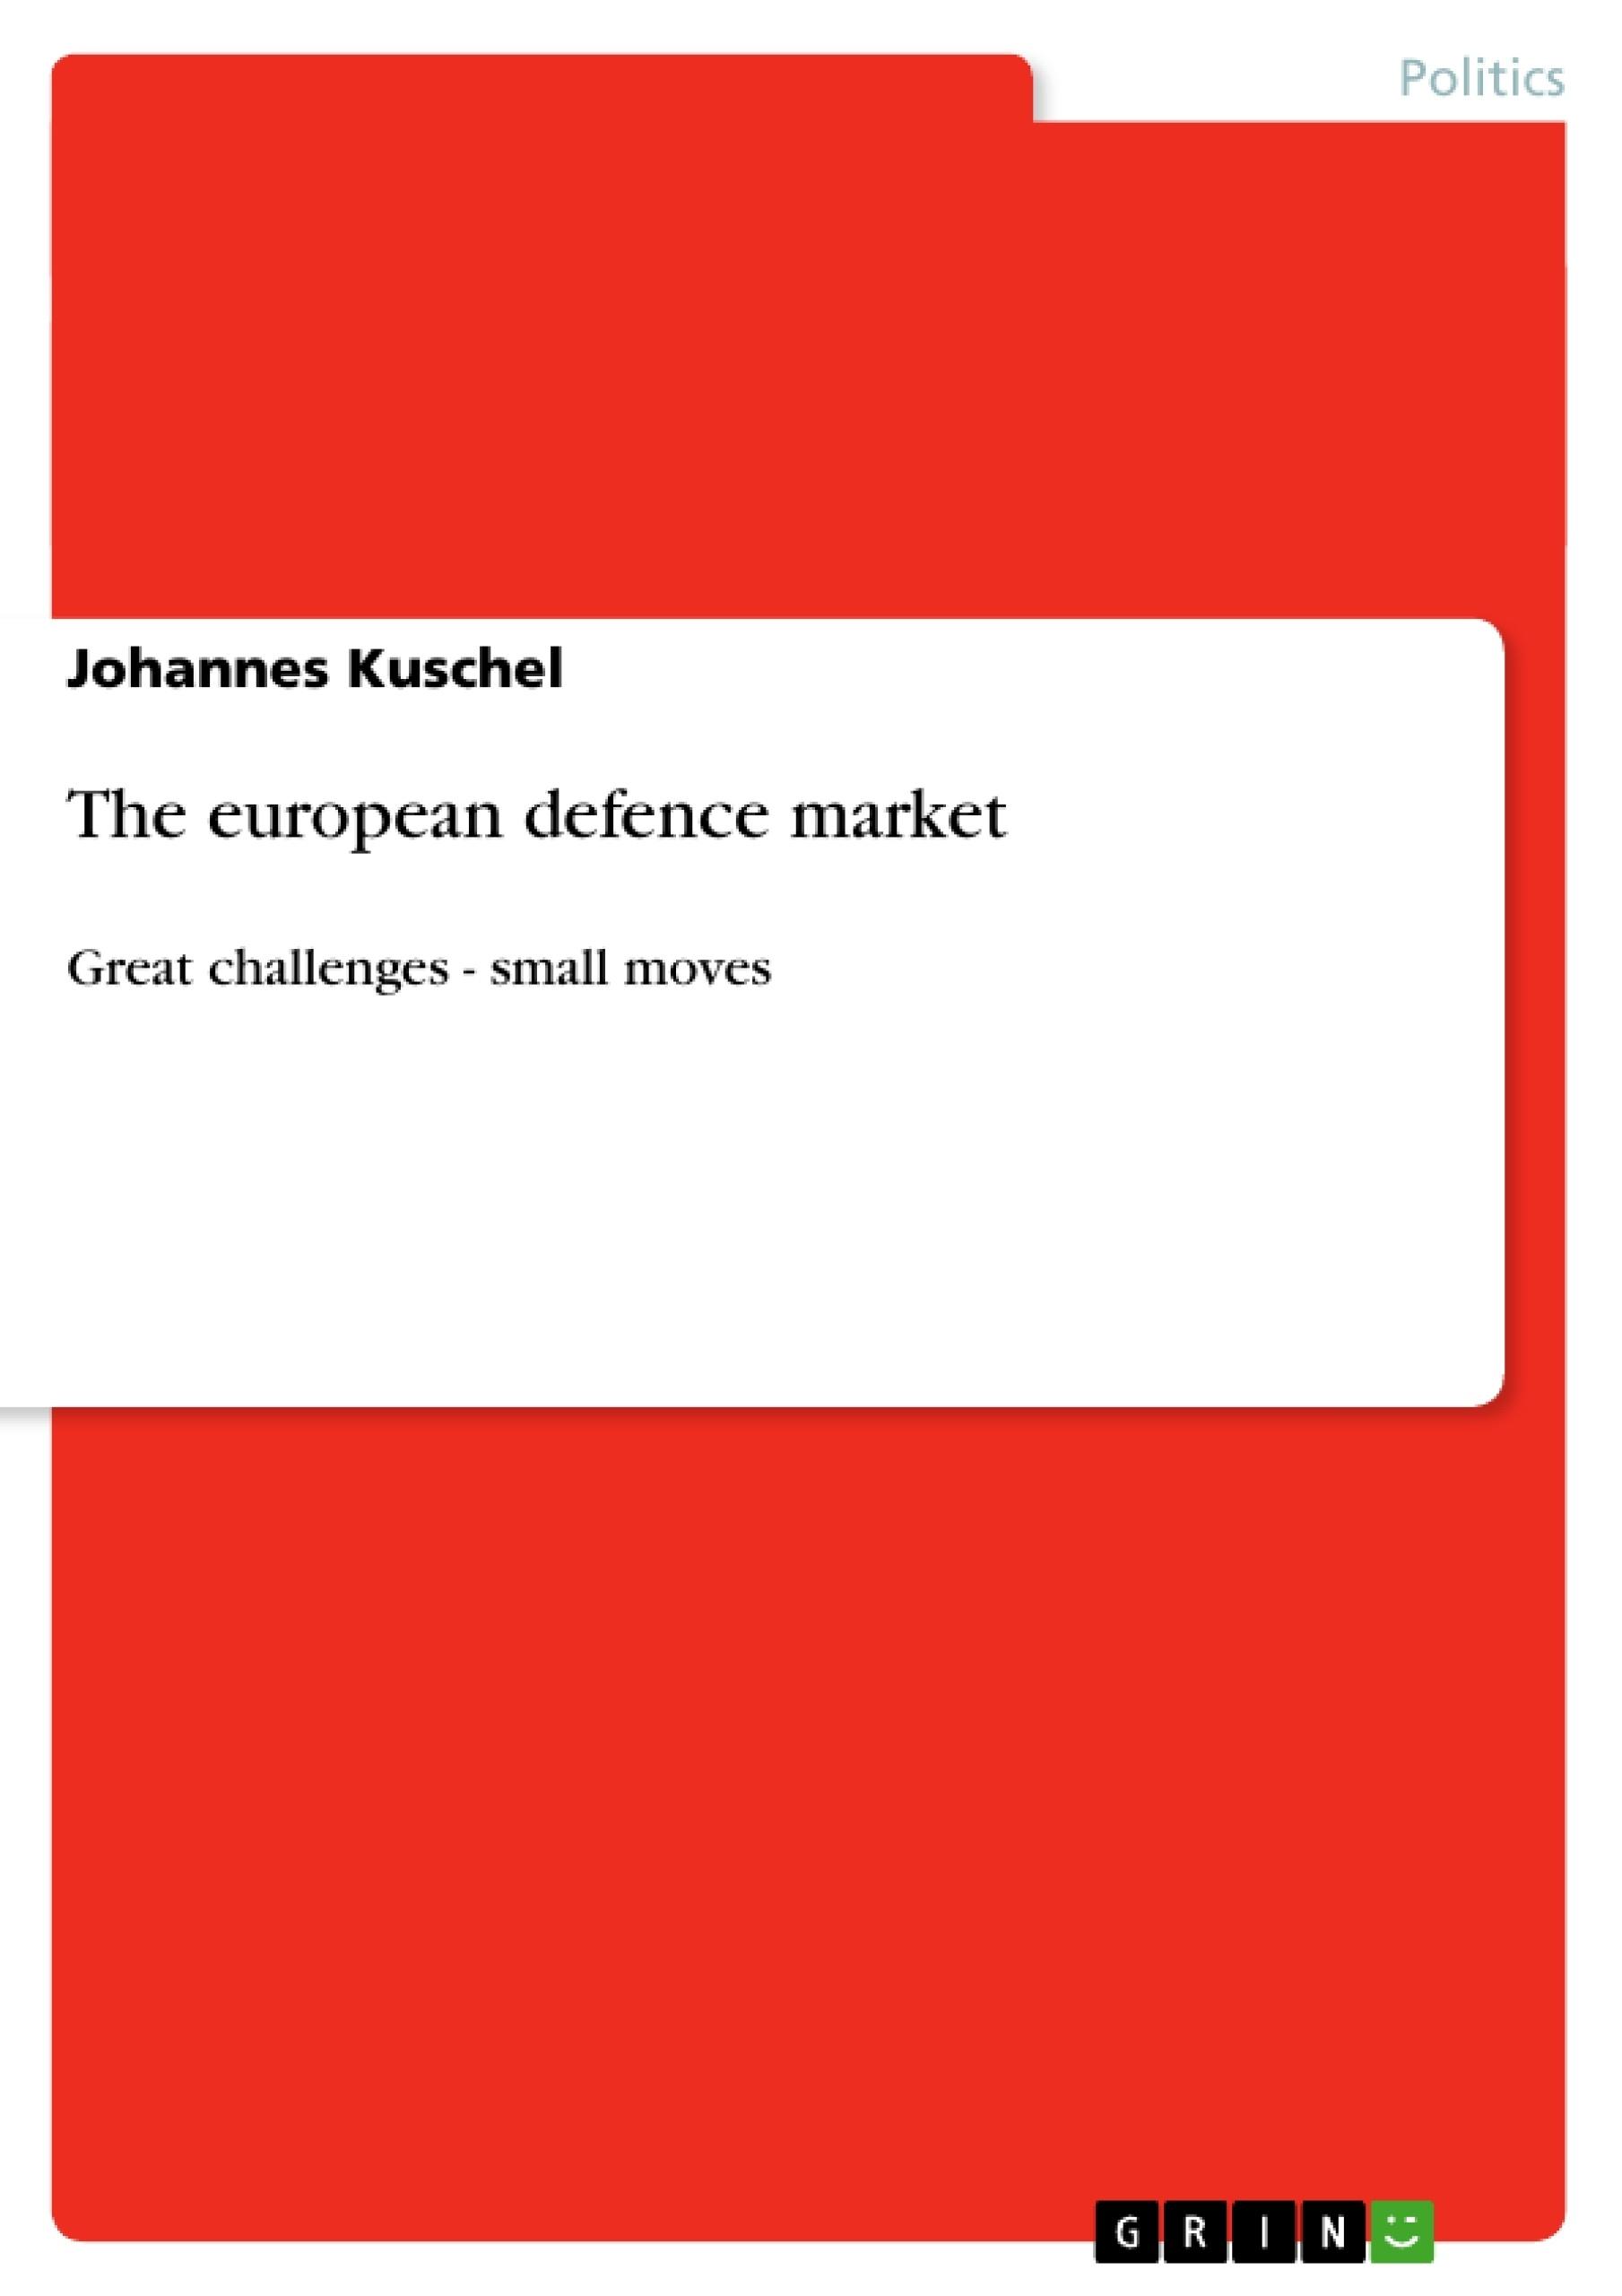 Title: The european defence market